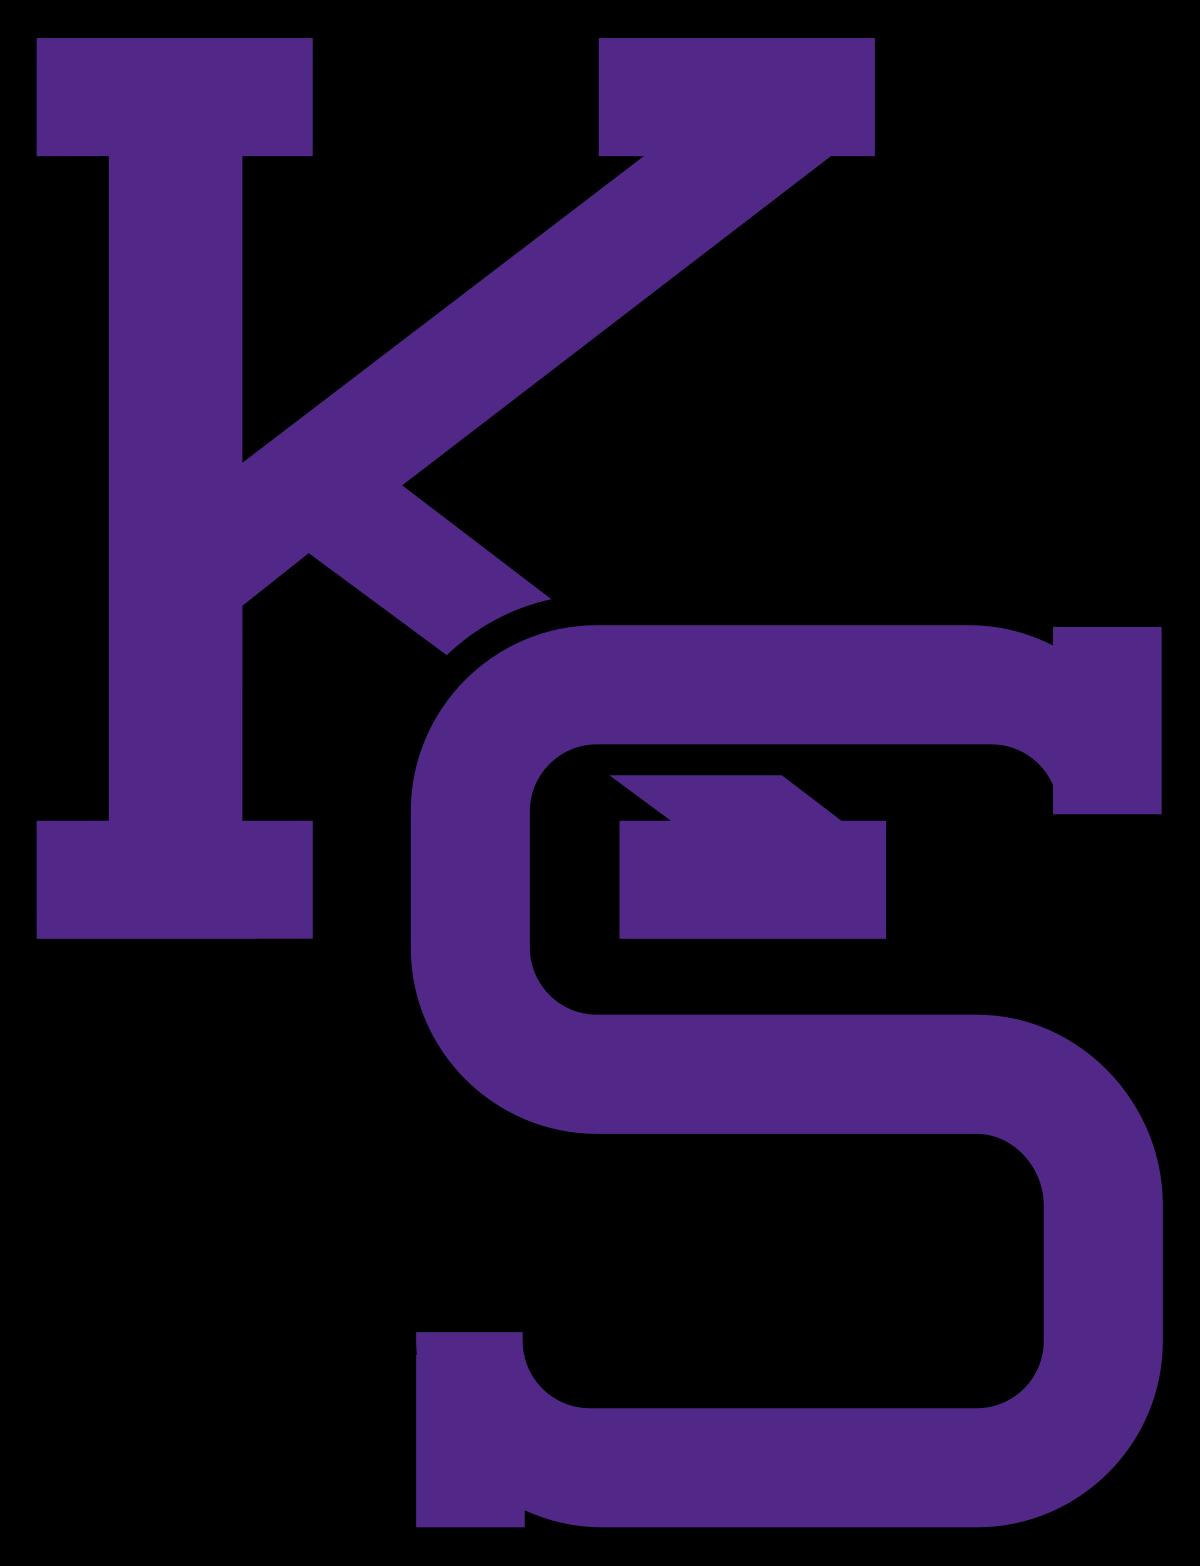 Kansas state baseball wikipedia. Wildcat clipart wildcats arizona